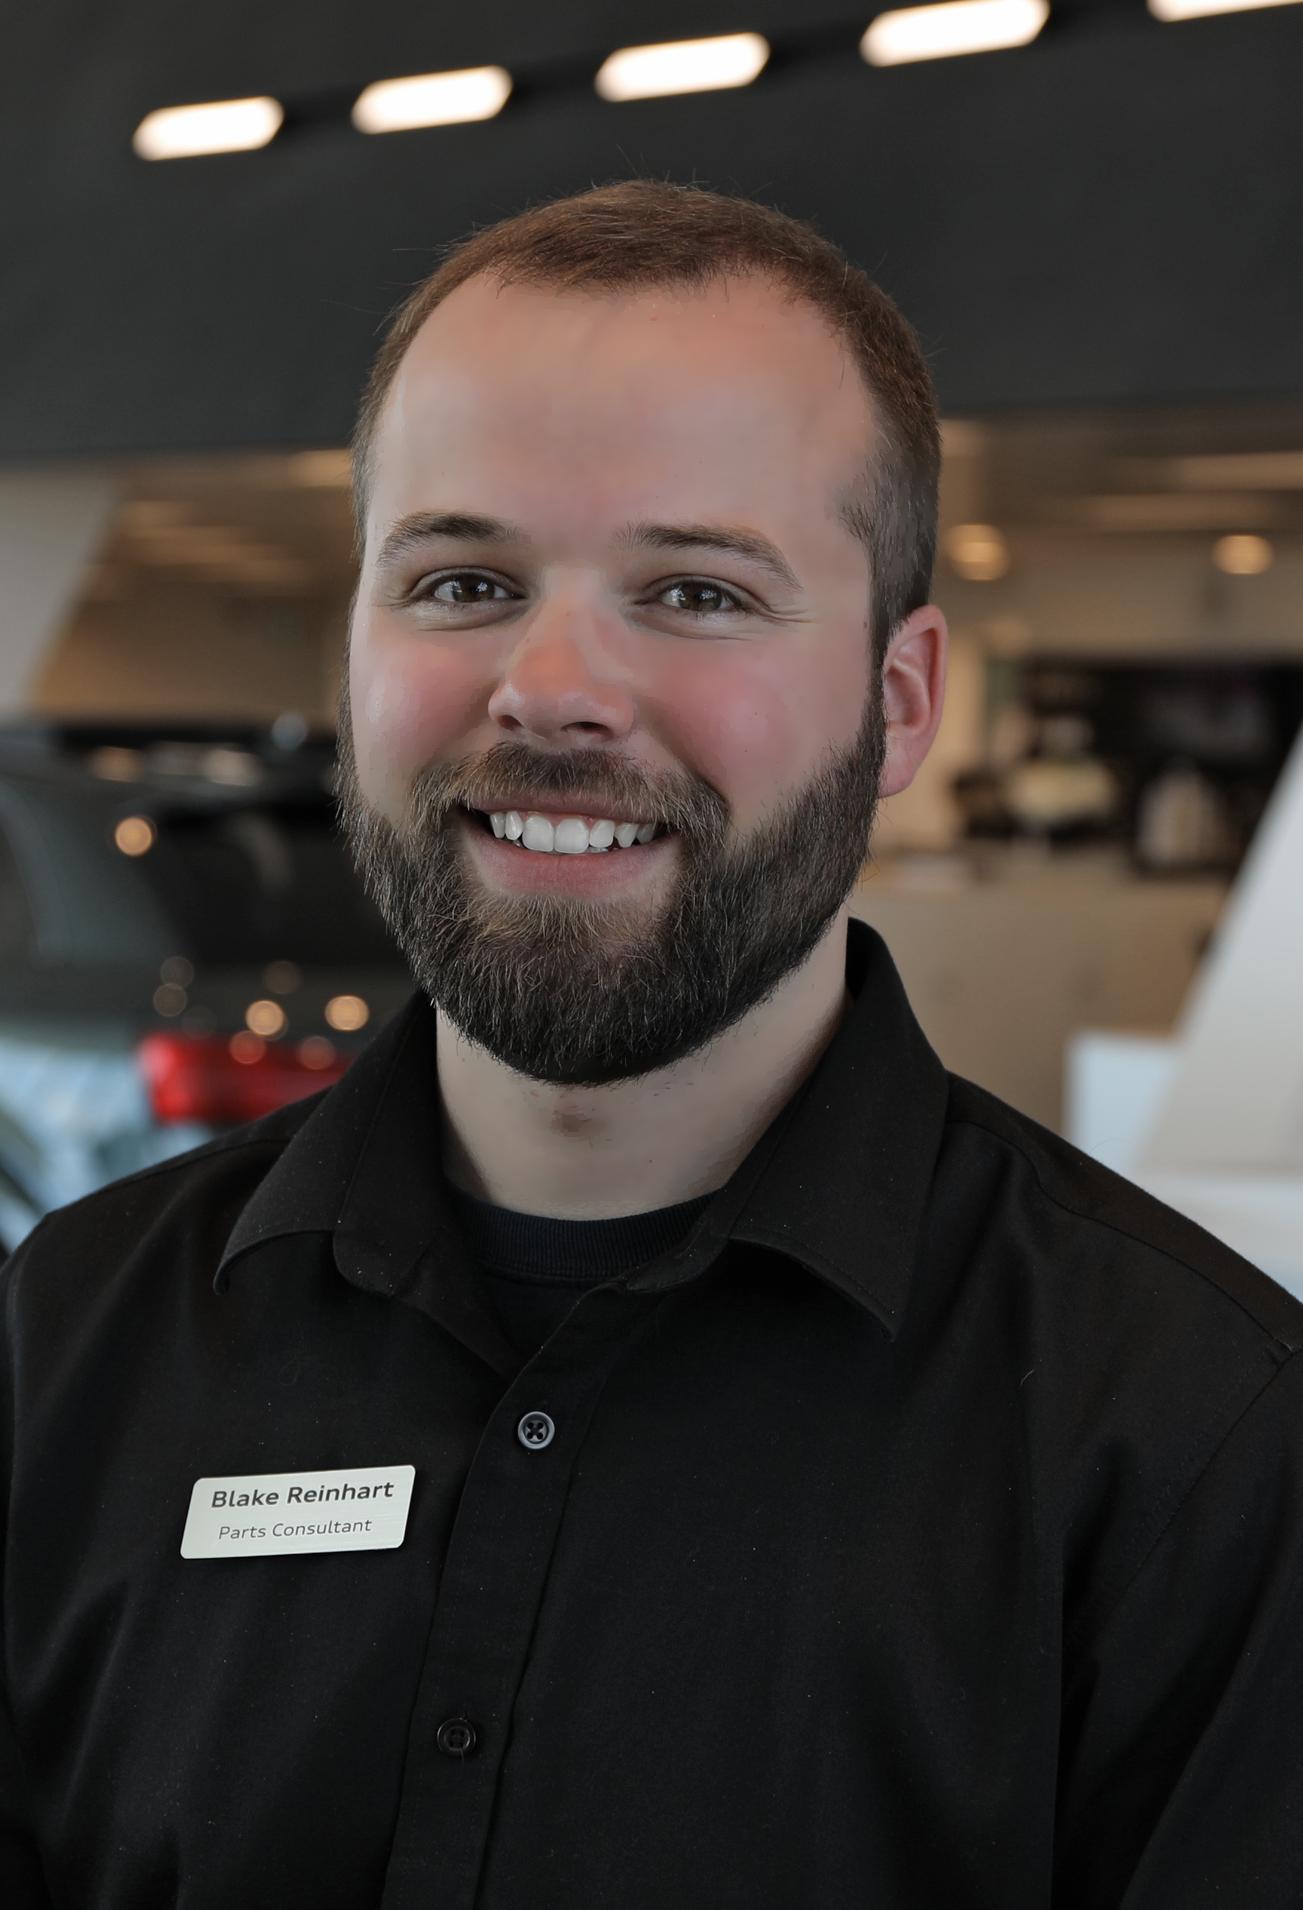 Blake Reinhart